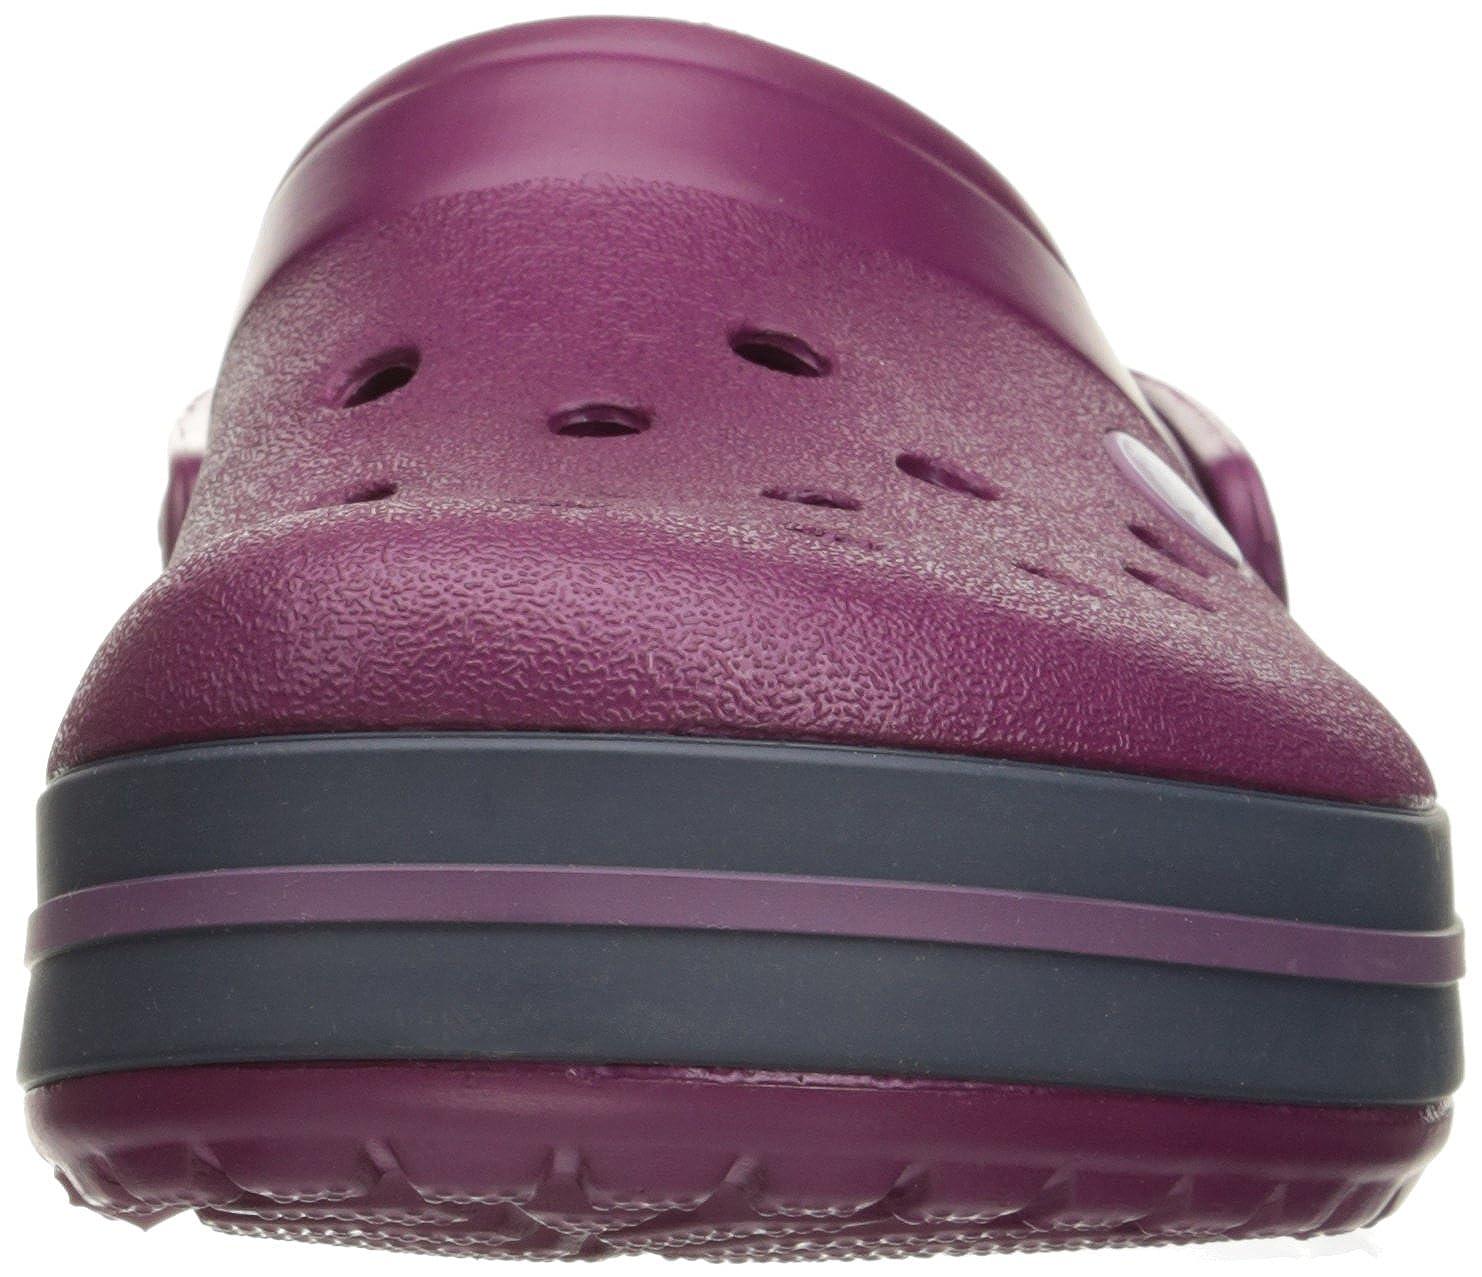 Crocs (Plum/Navy) Unisex-Erwachsene Crocband Clogs Violett (Plum/Navy) Crocs 96194c